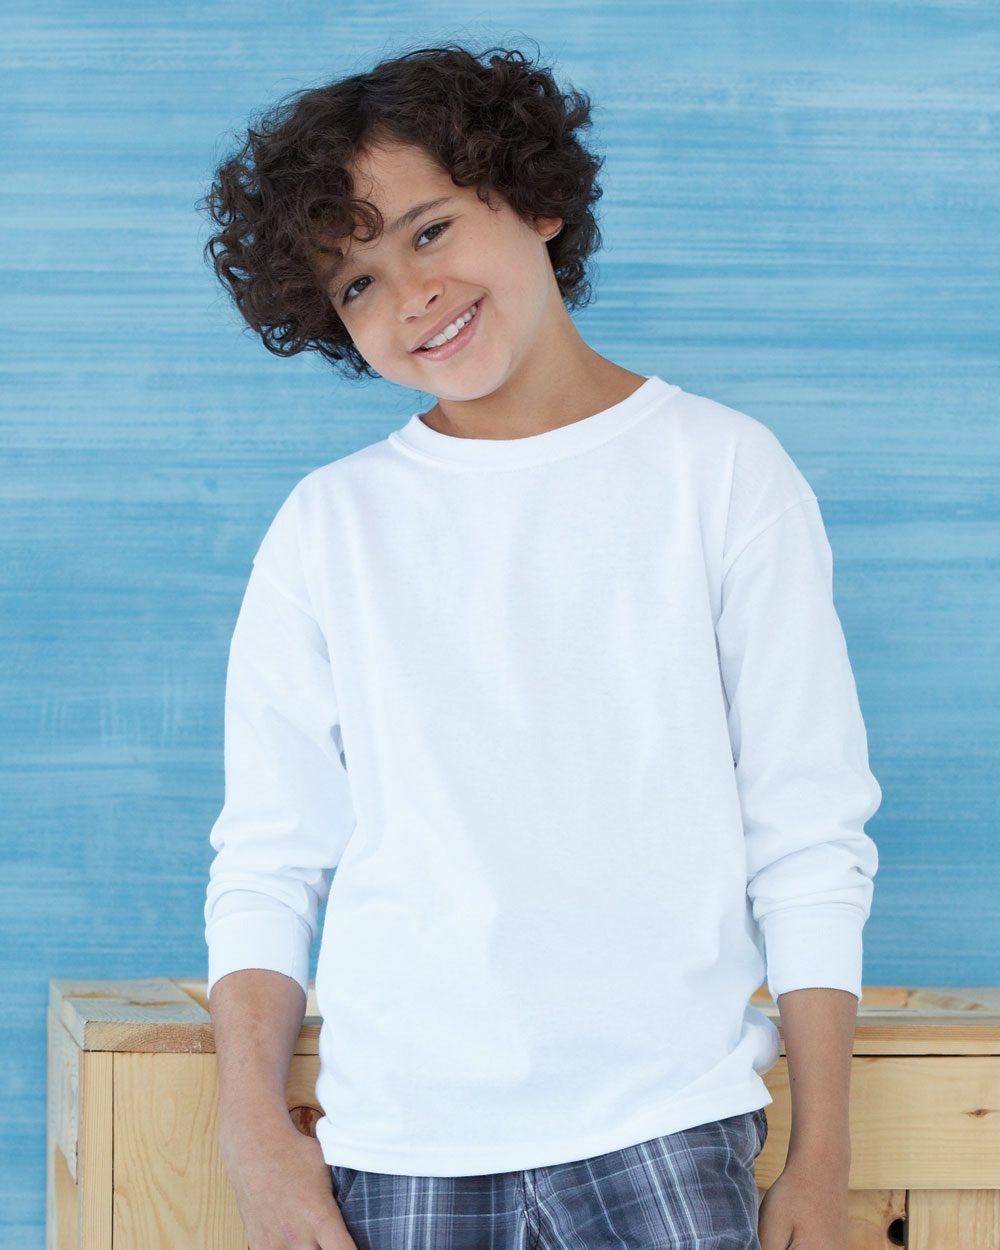 Custom Printed Kids Long Sleeve T Shirts Screen Printed Shirts